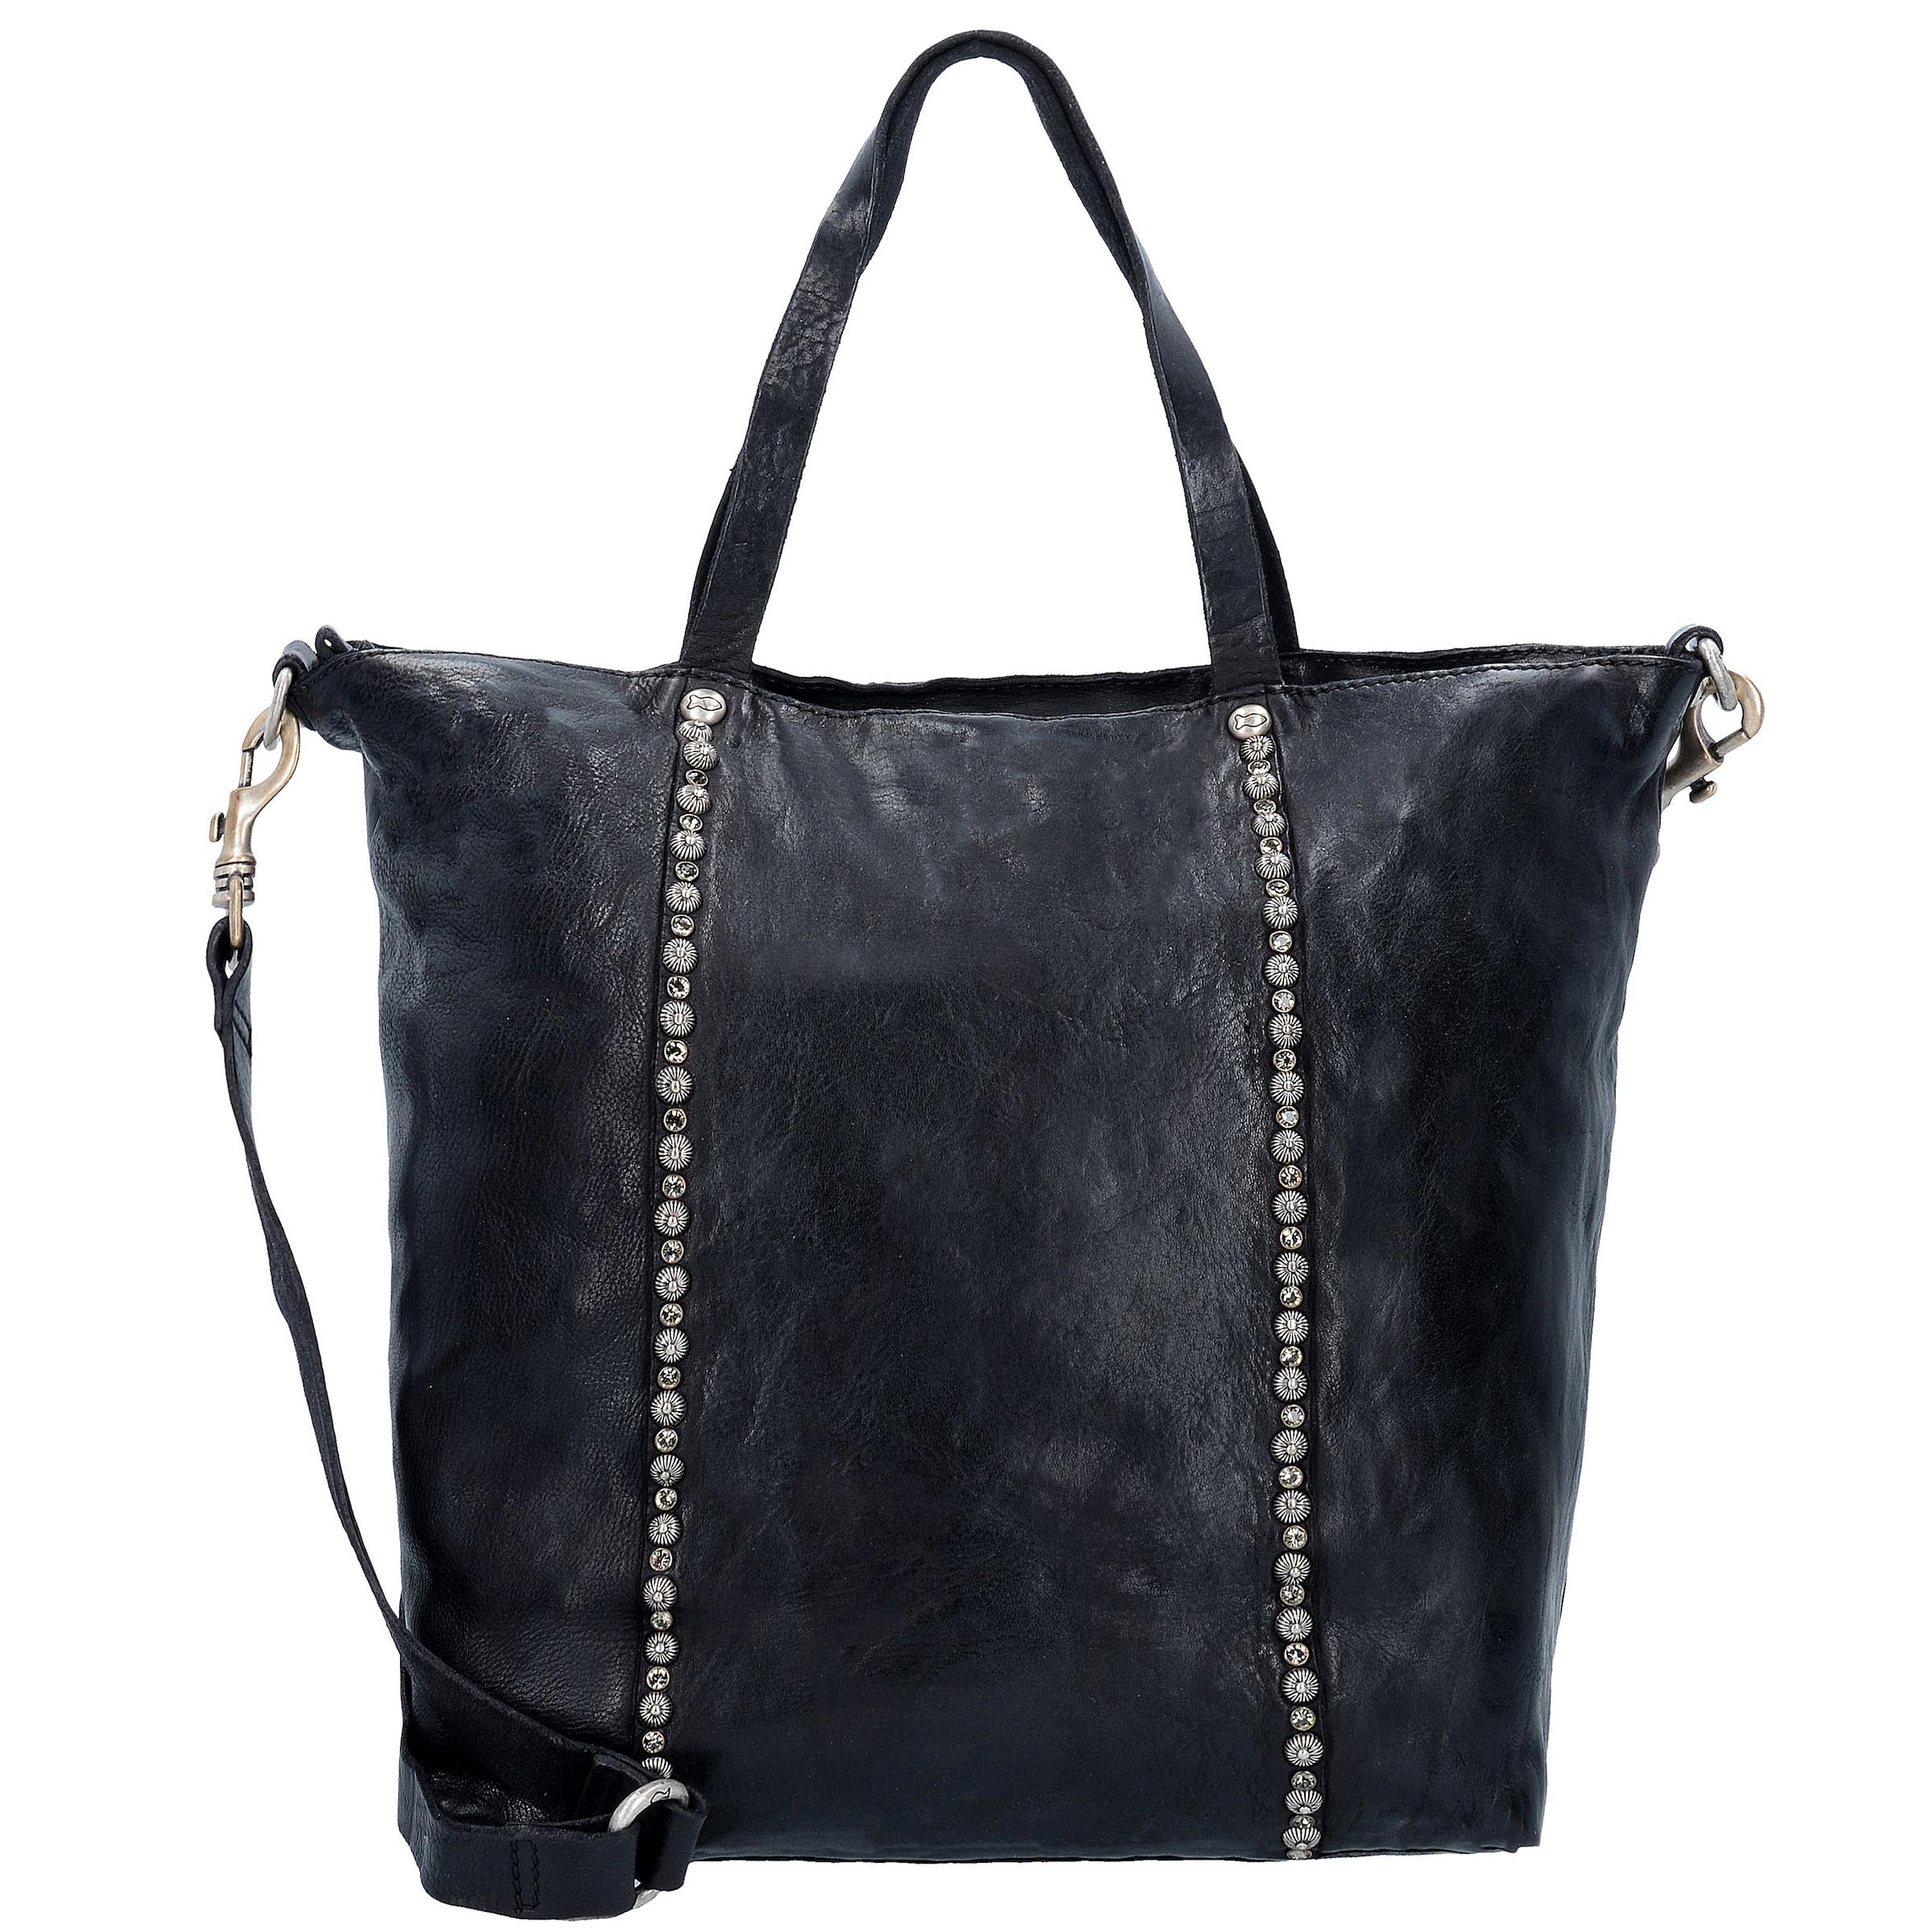 Spielraum Perfekt Outlet Günstig Online Campomaggi Damiana Shopper Tasche Leder 31 cm lTheFBf5